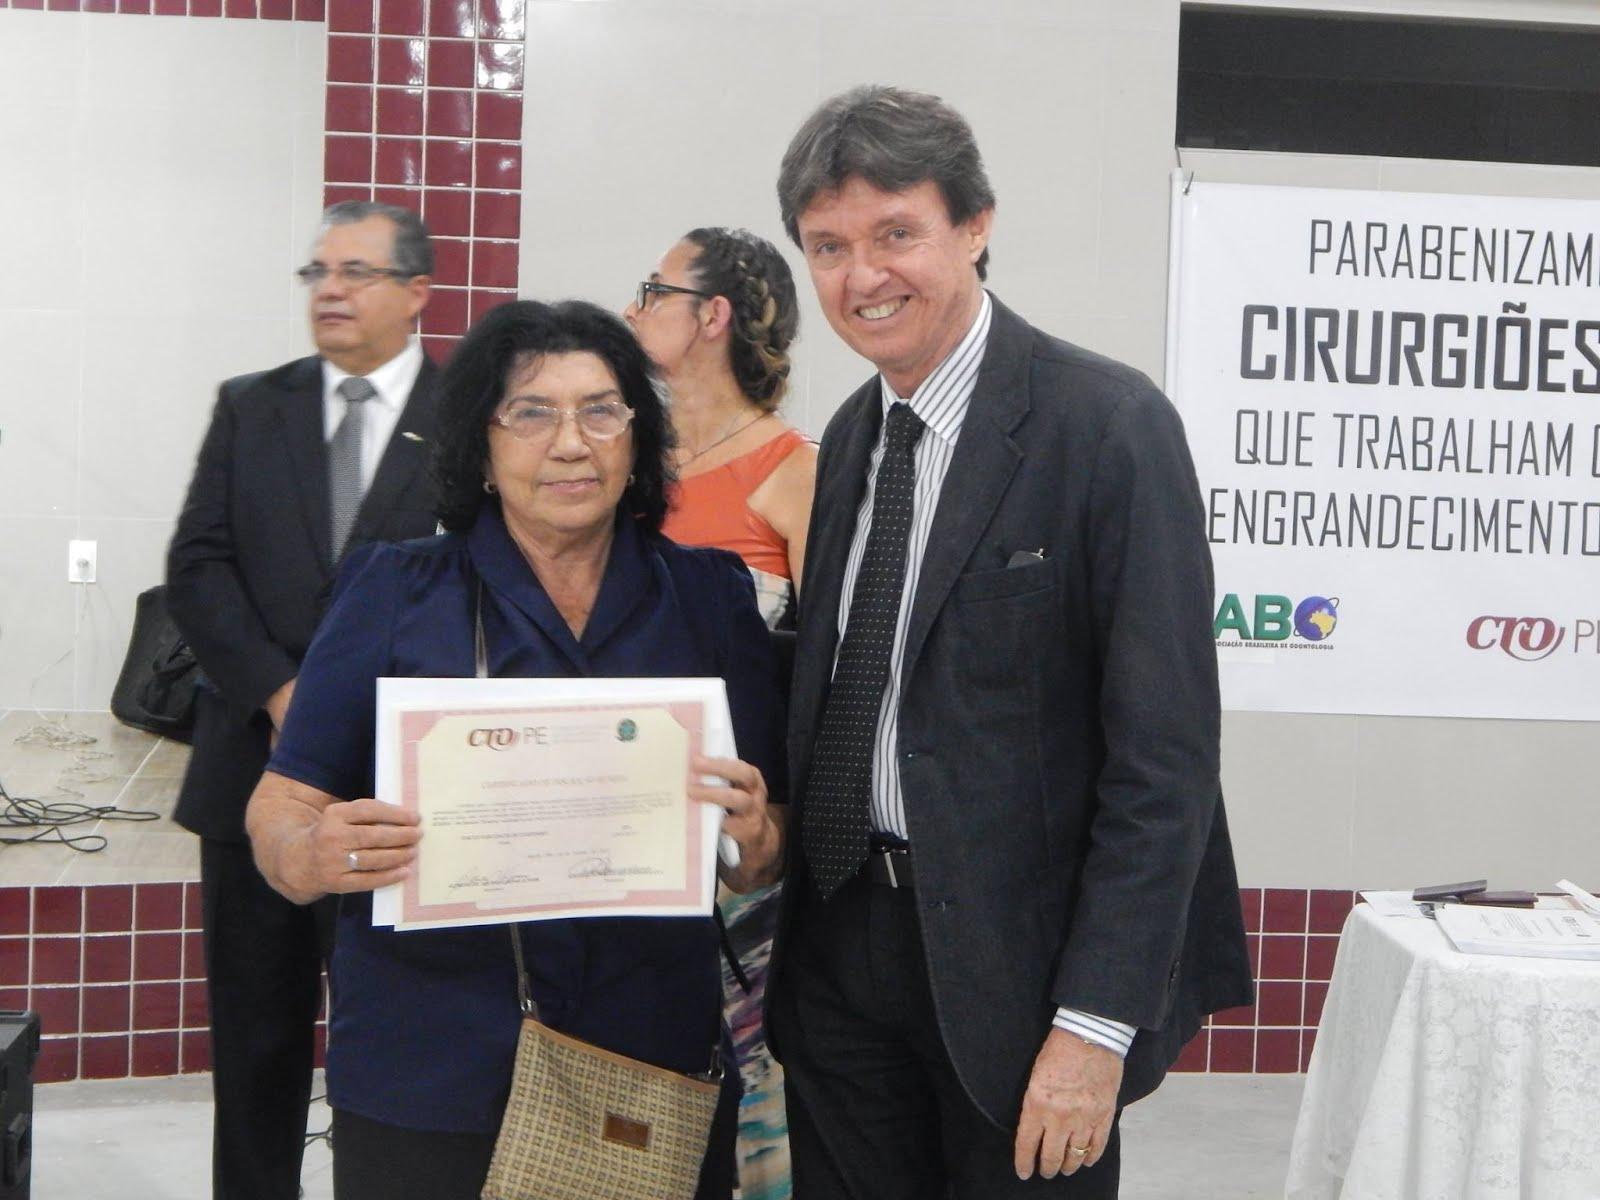 CONSELHO REGIONAL DE ODONTOLOGIA DE PERNAMBUCO